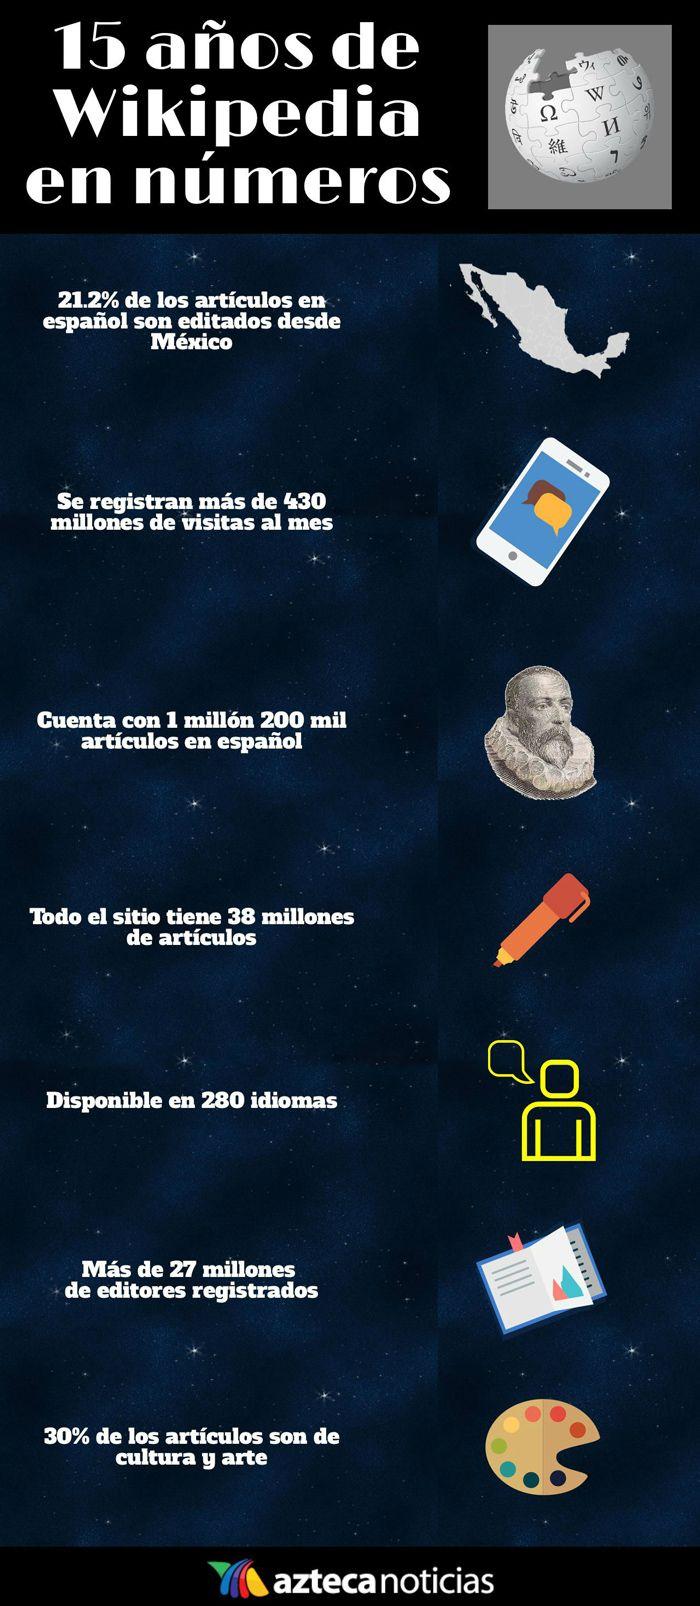 Ms de 25 ideas increbles sobre matematica wikipedia en pinterest 15 aos de wikipedia infografia urtaz Choice Image